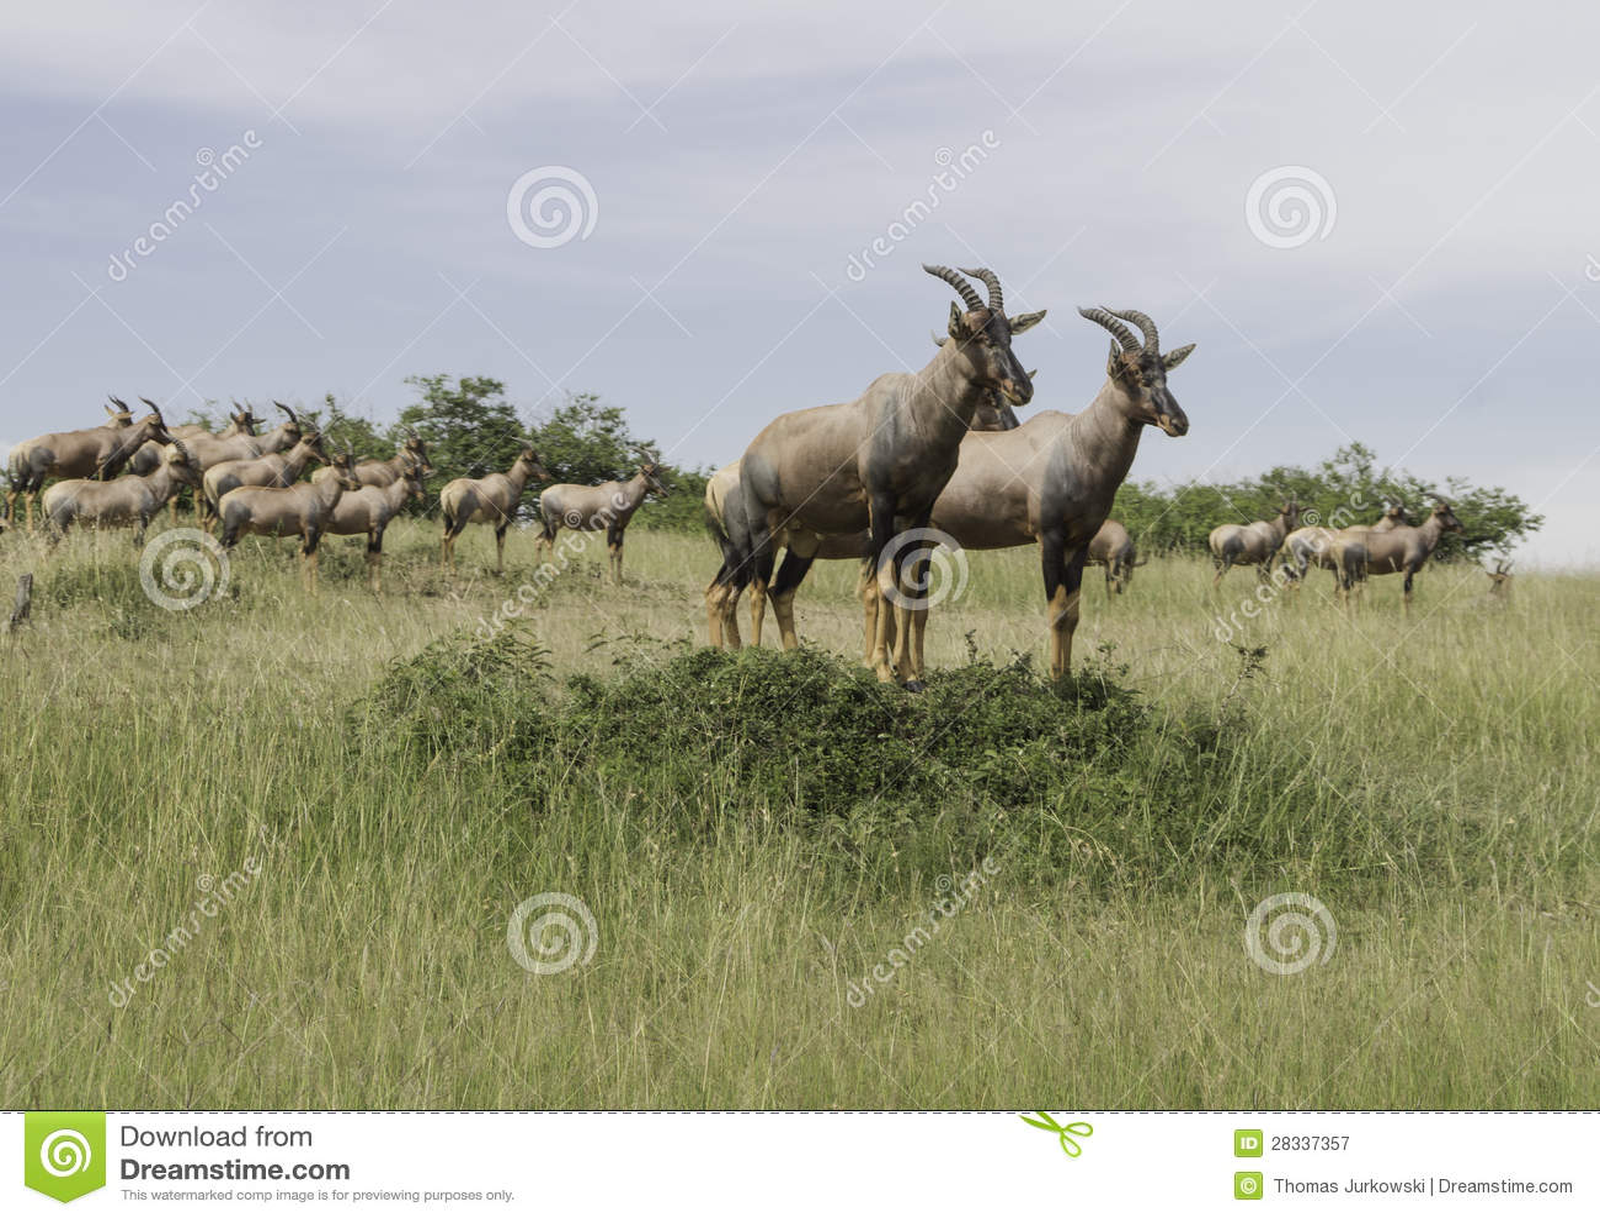 A herd of antelope Topi